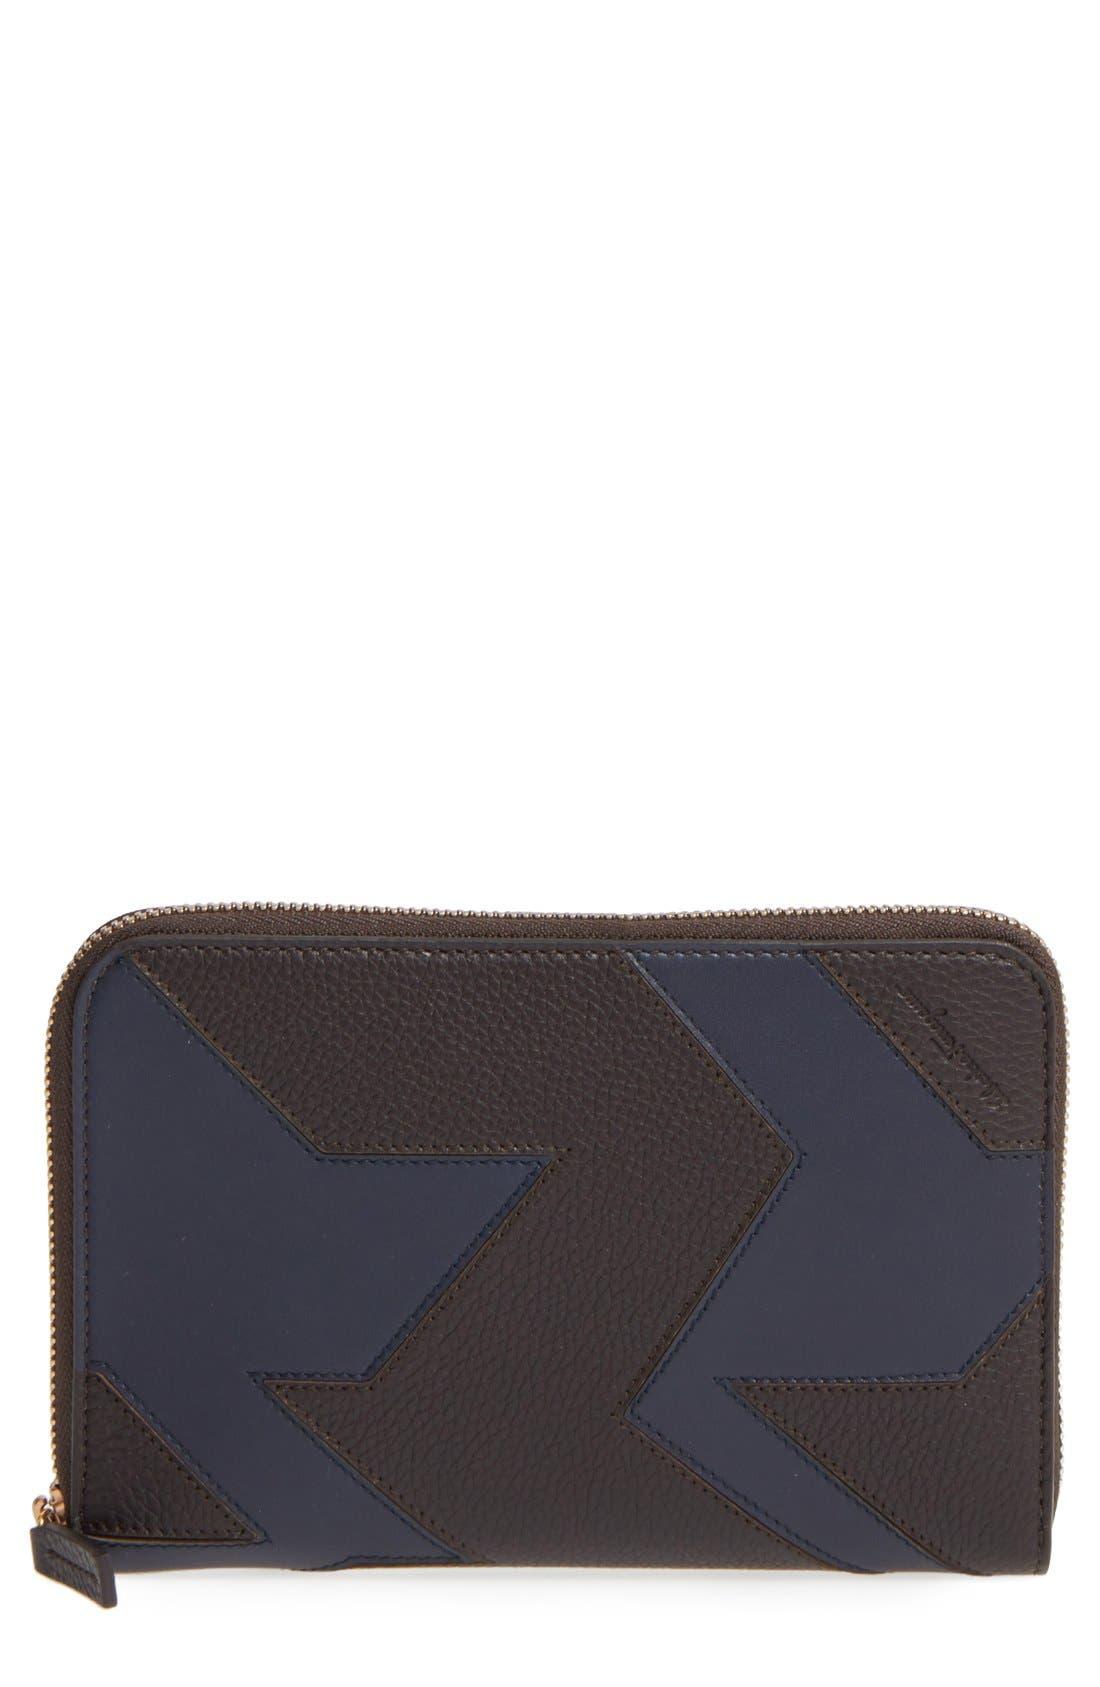 Salvatore Ferragamo Vienna Zip Wallet